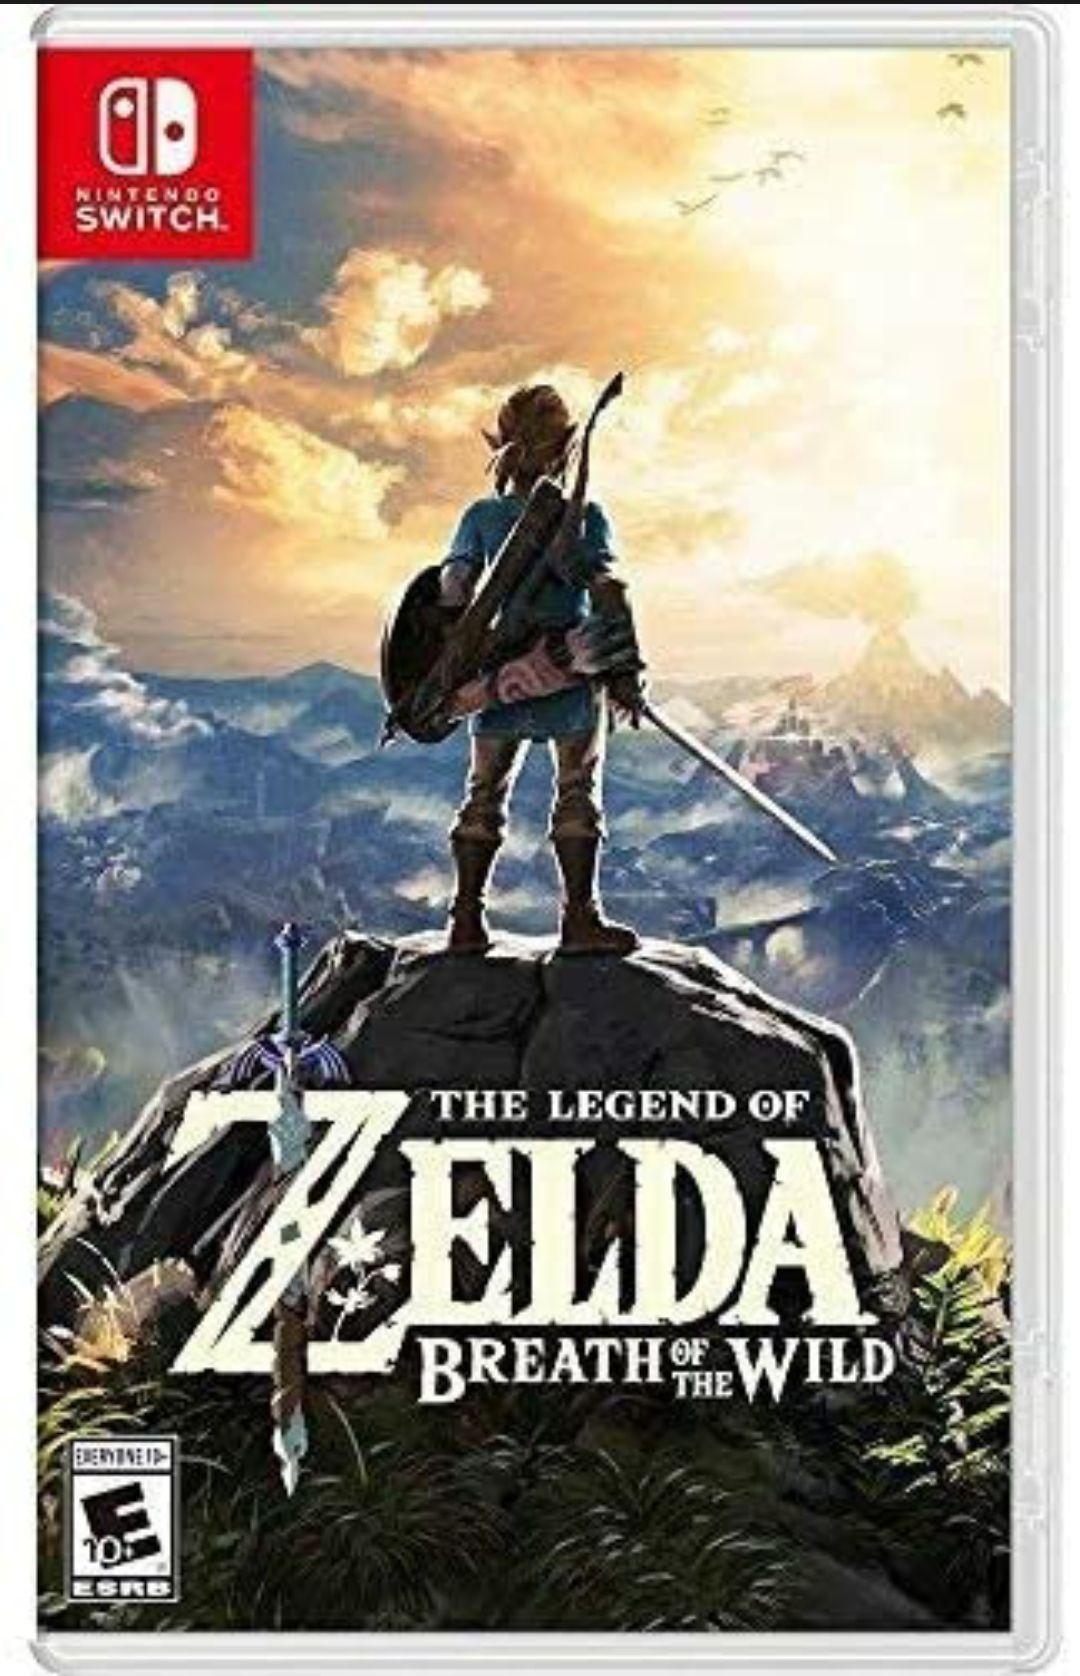 Amazon: The Legend of Zelda: Breath of the Wild - Nintendo Switch - Standard Edition